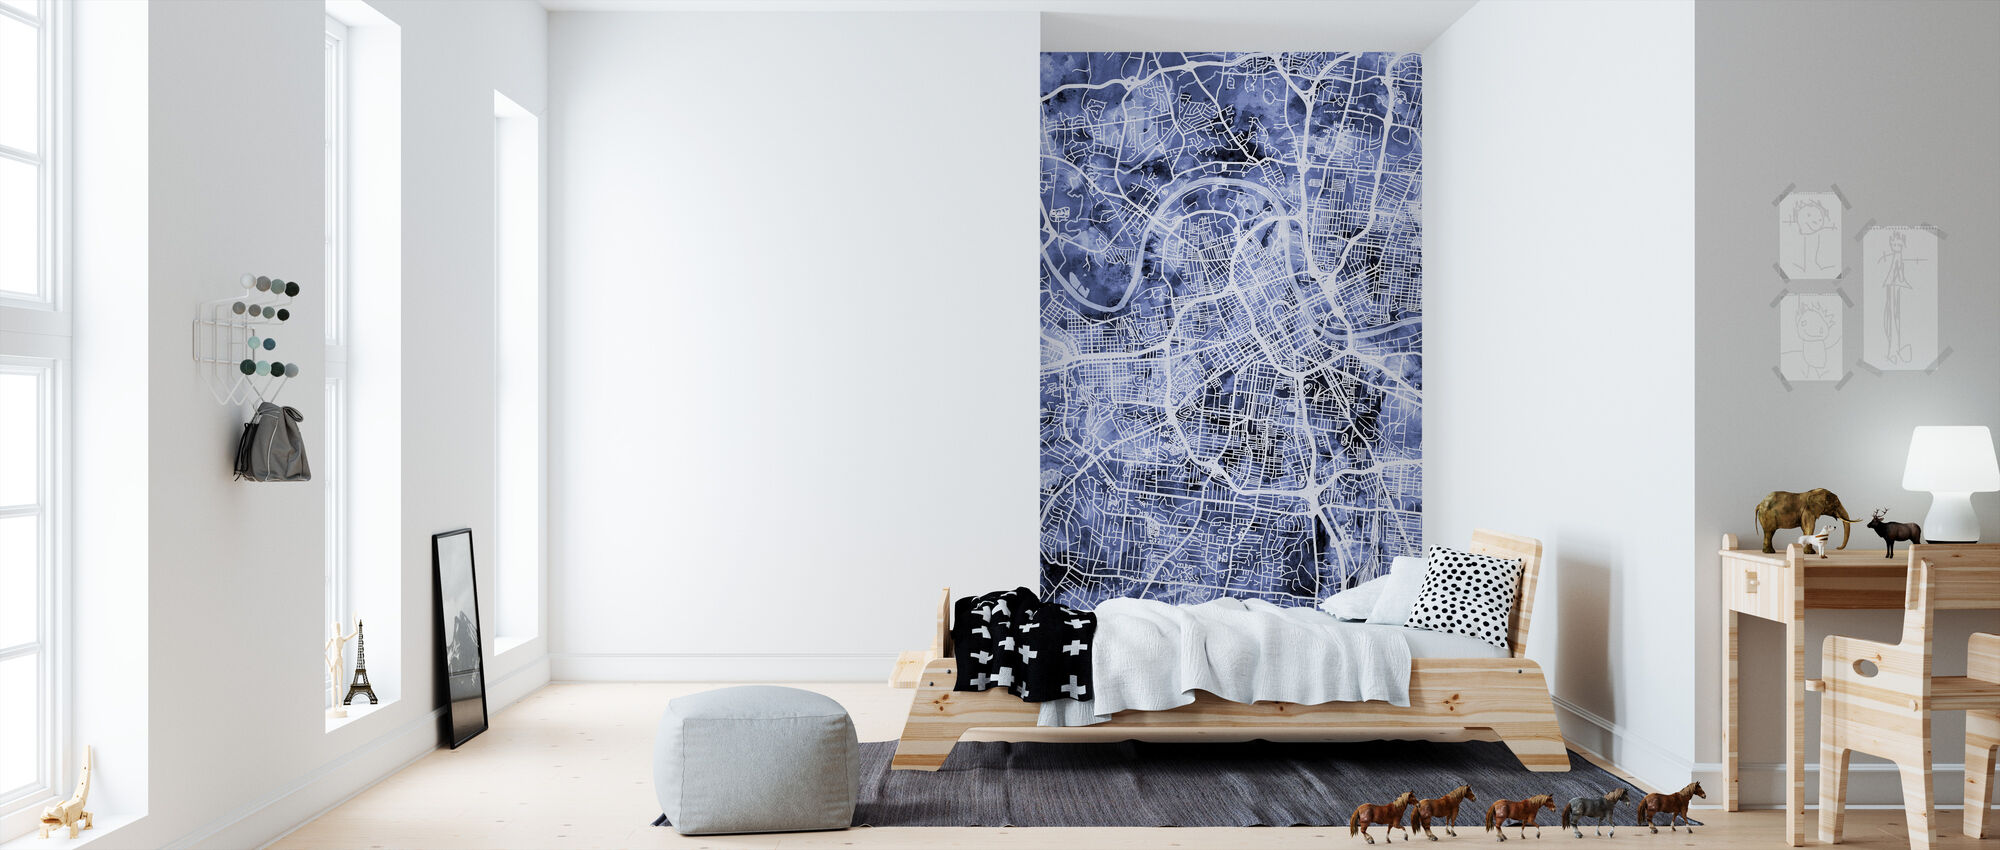 Nashville Tennessee City Map - Wallpaper - Kids Room